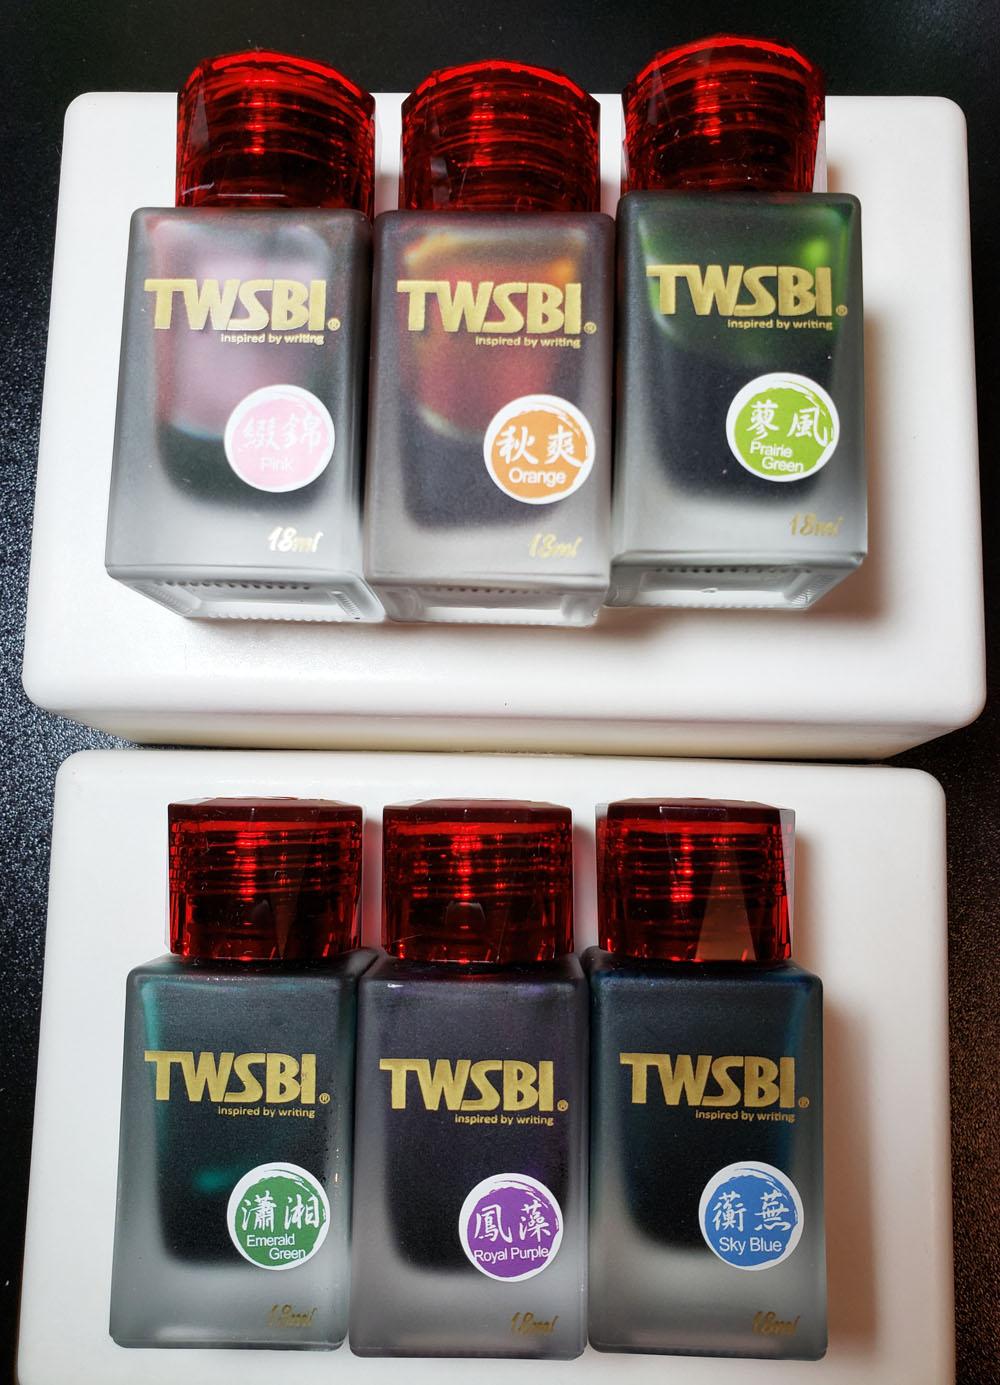 TWSBI bottles